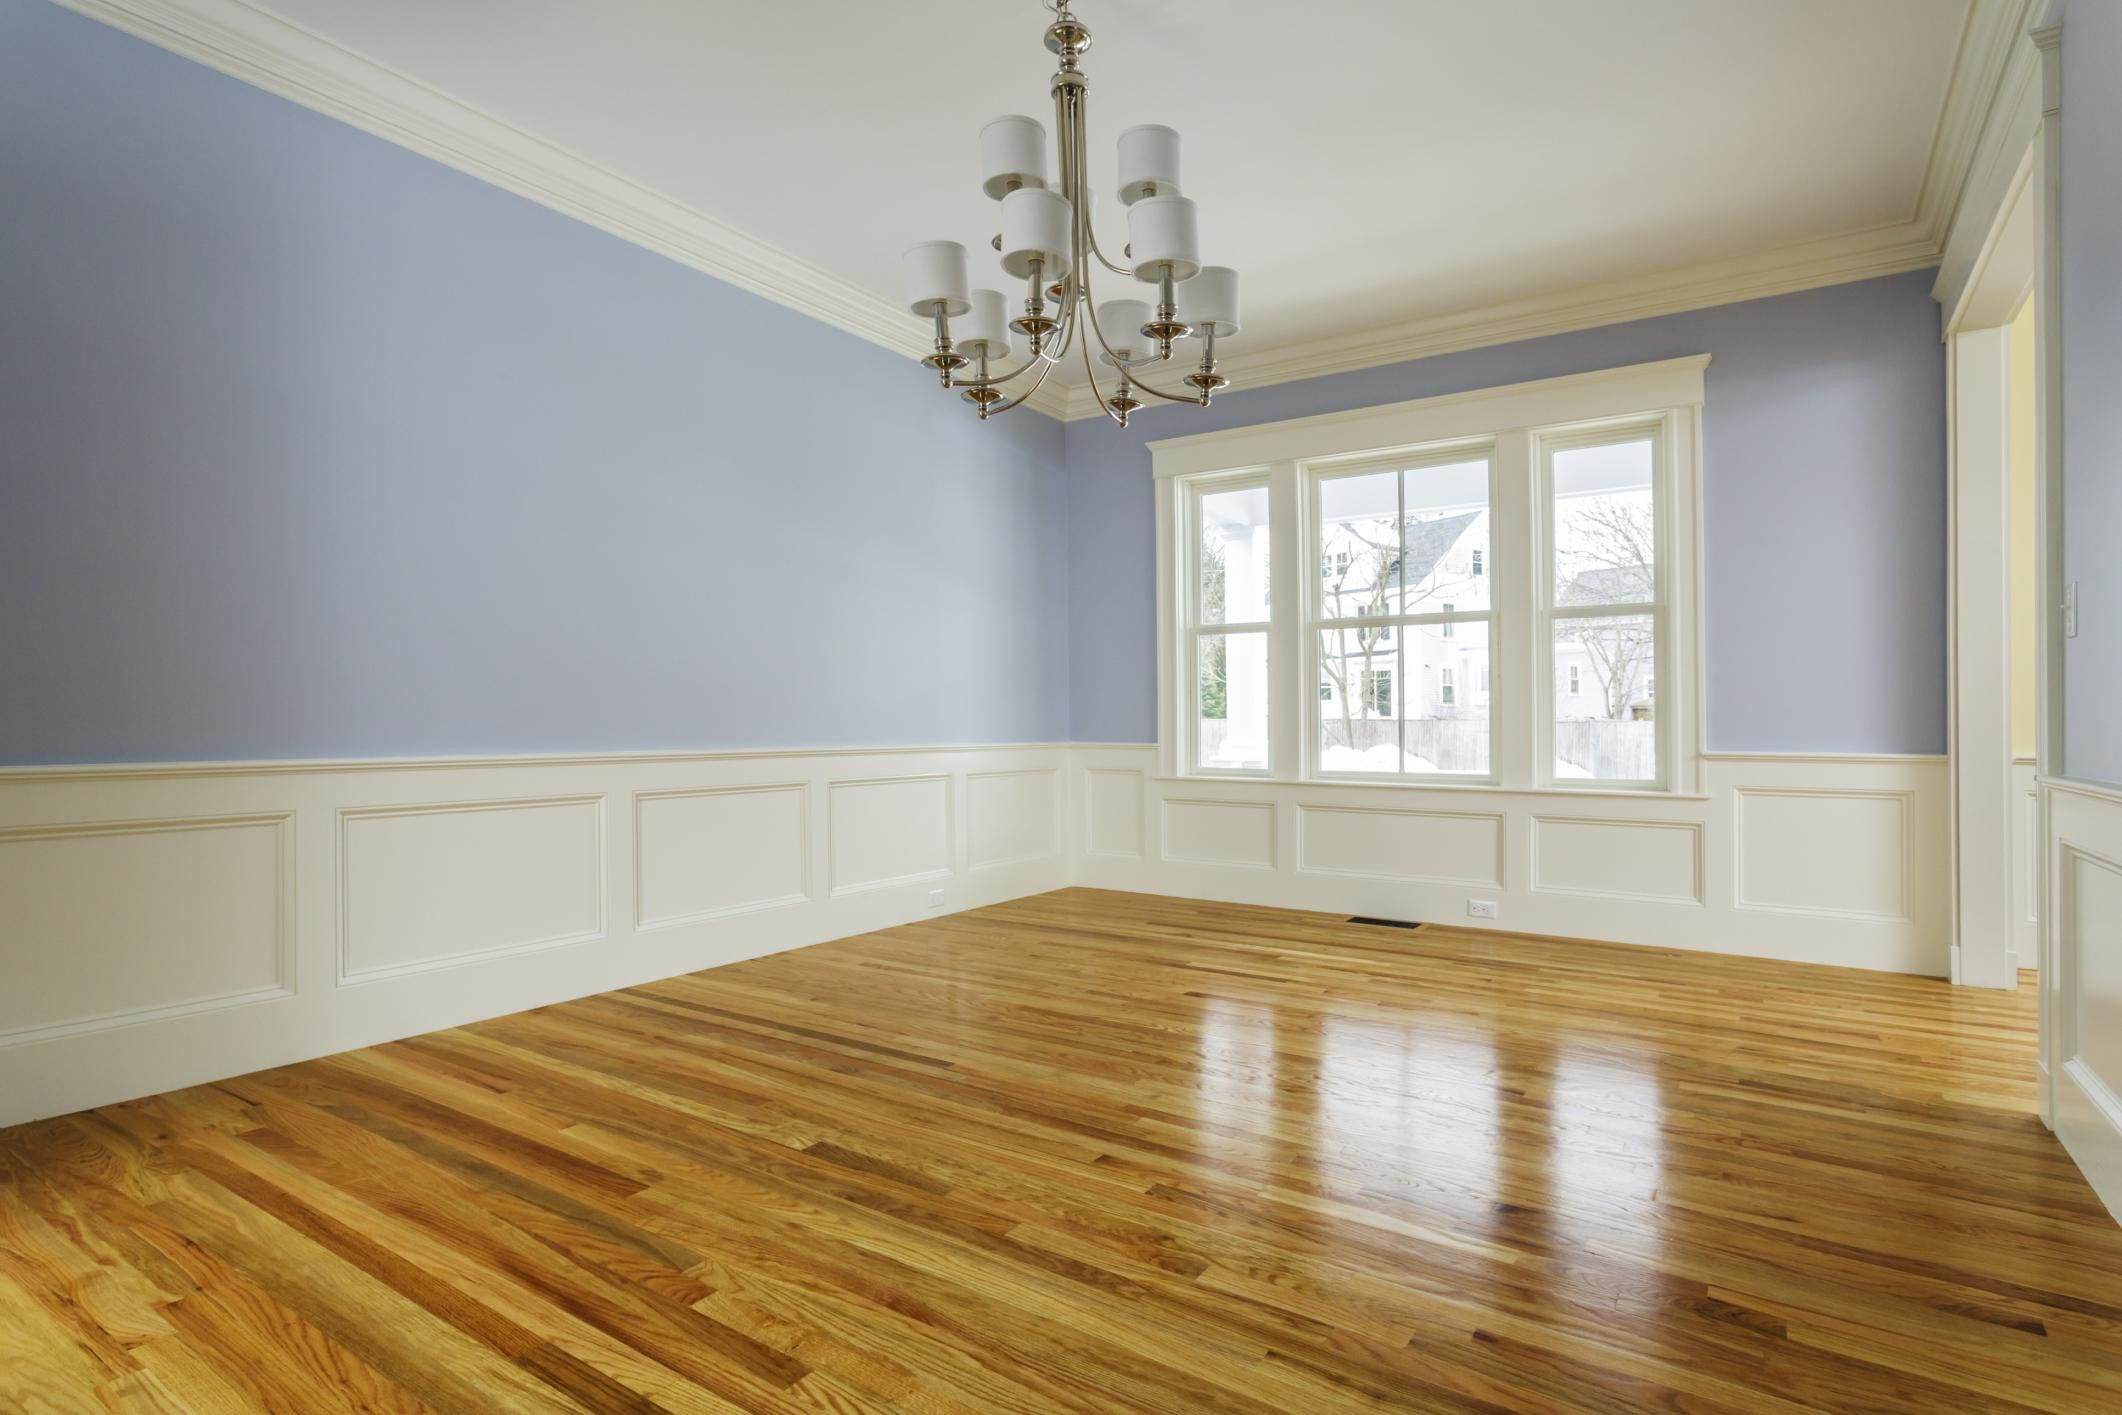 hardwood flooring company name ideas of engineered laminate solid hardwood wood flooring pertaining to 168686572 56a49ed73df78cf772834d31